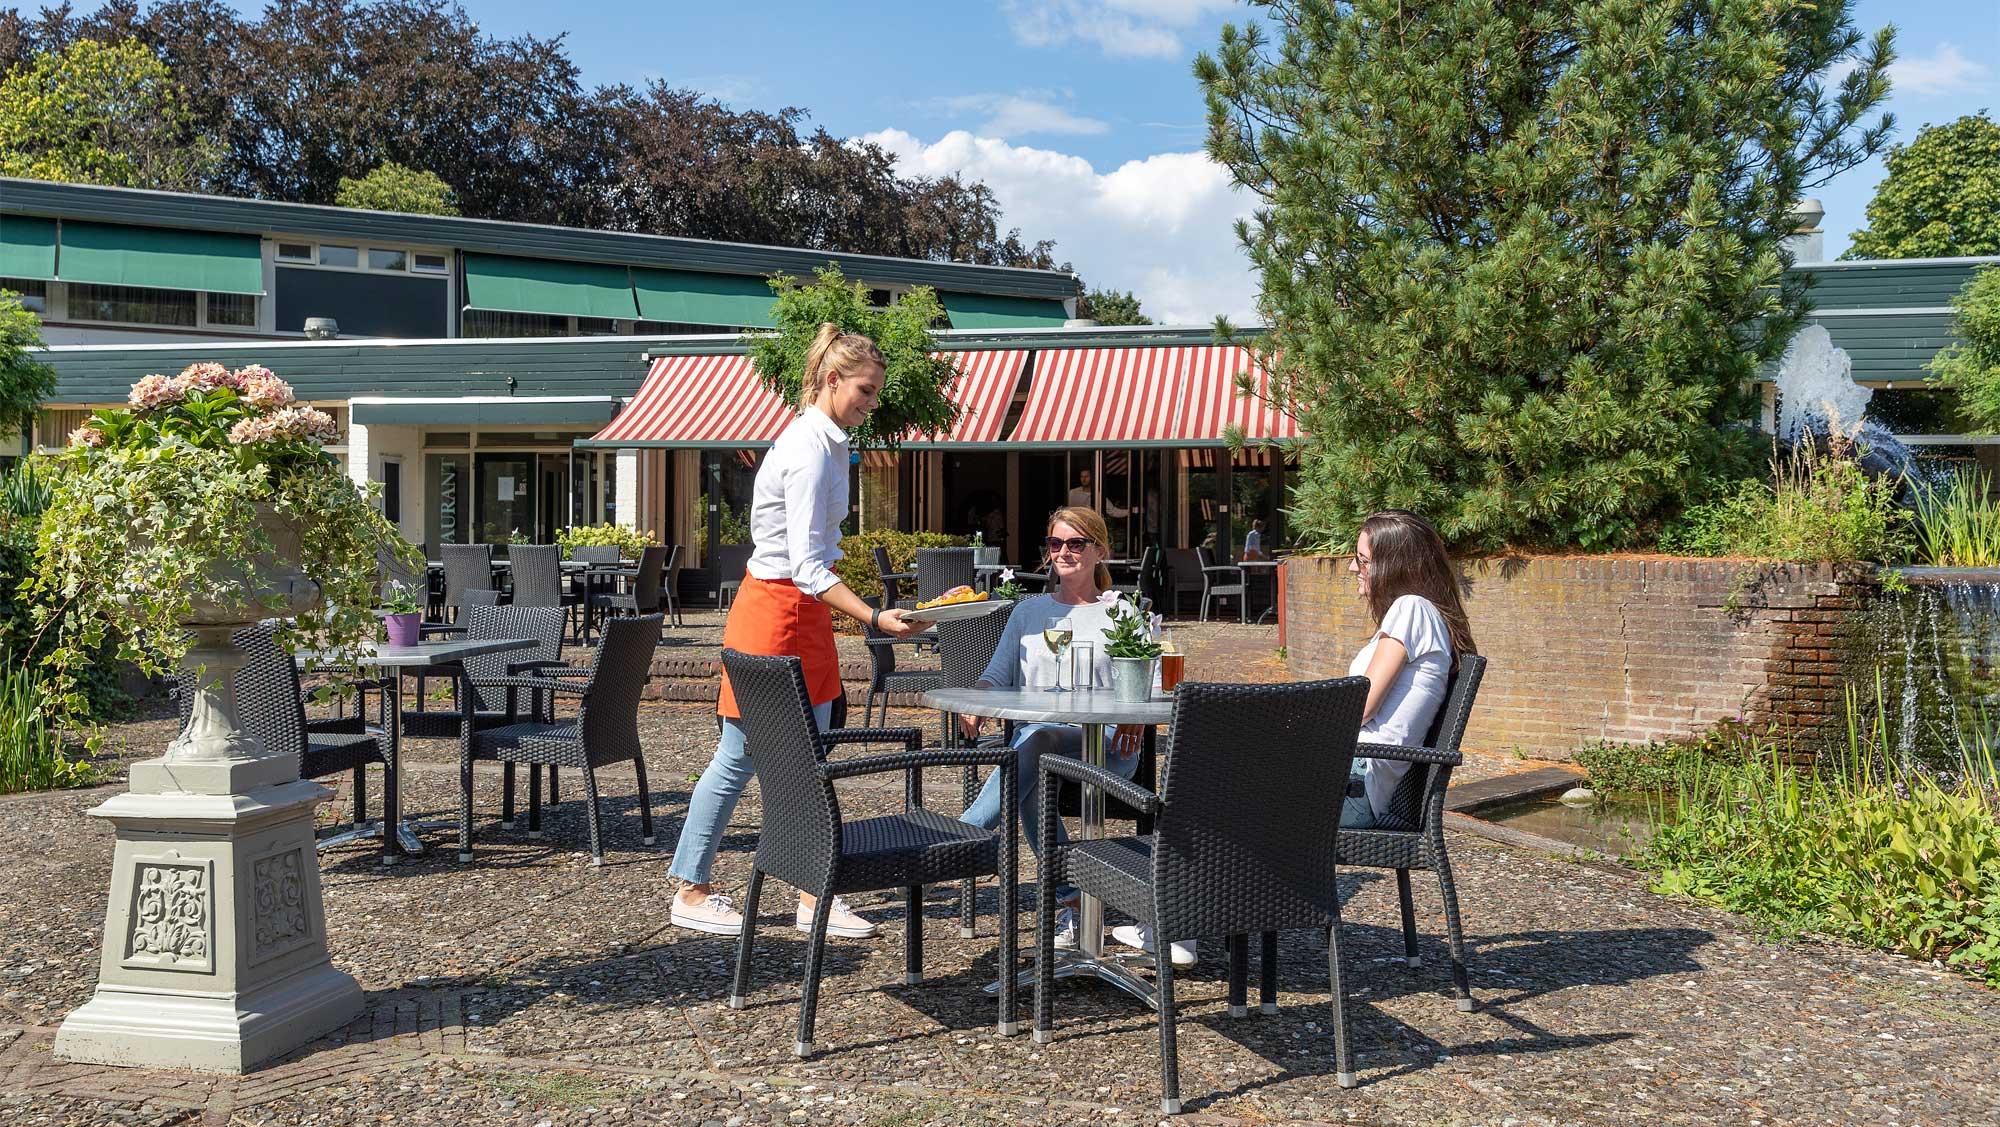 Eten en drinken Ginkeltuin Molecaten Park Landgoed Ginkelduin 10